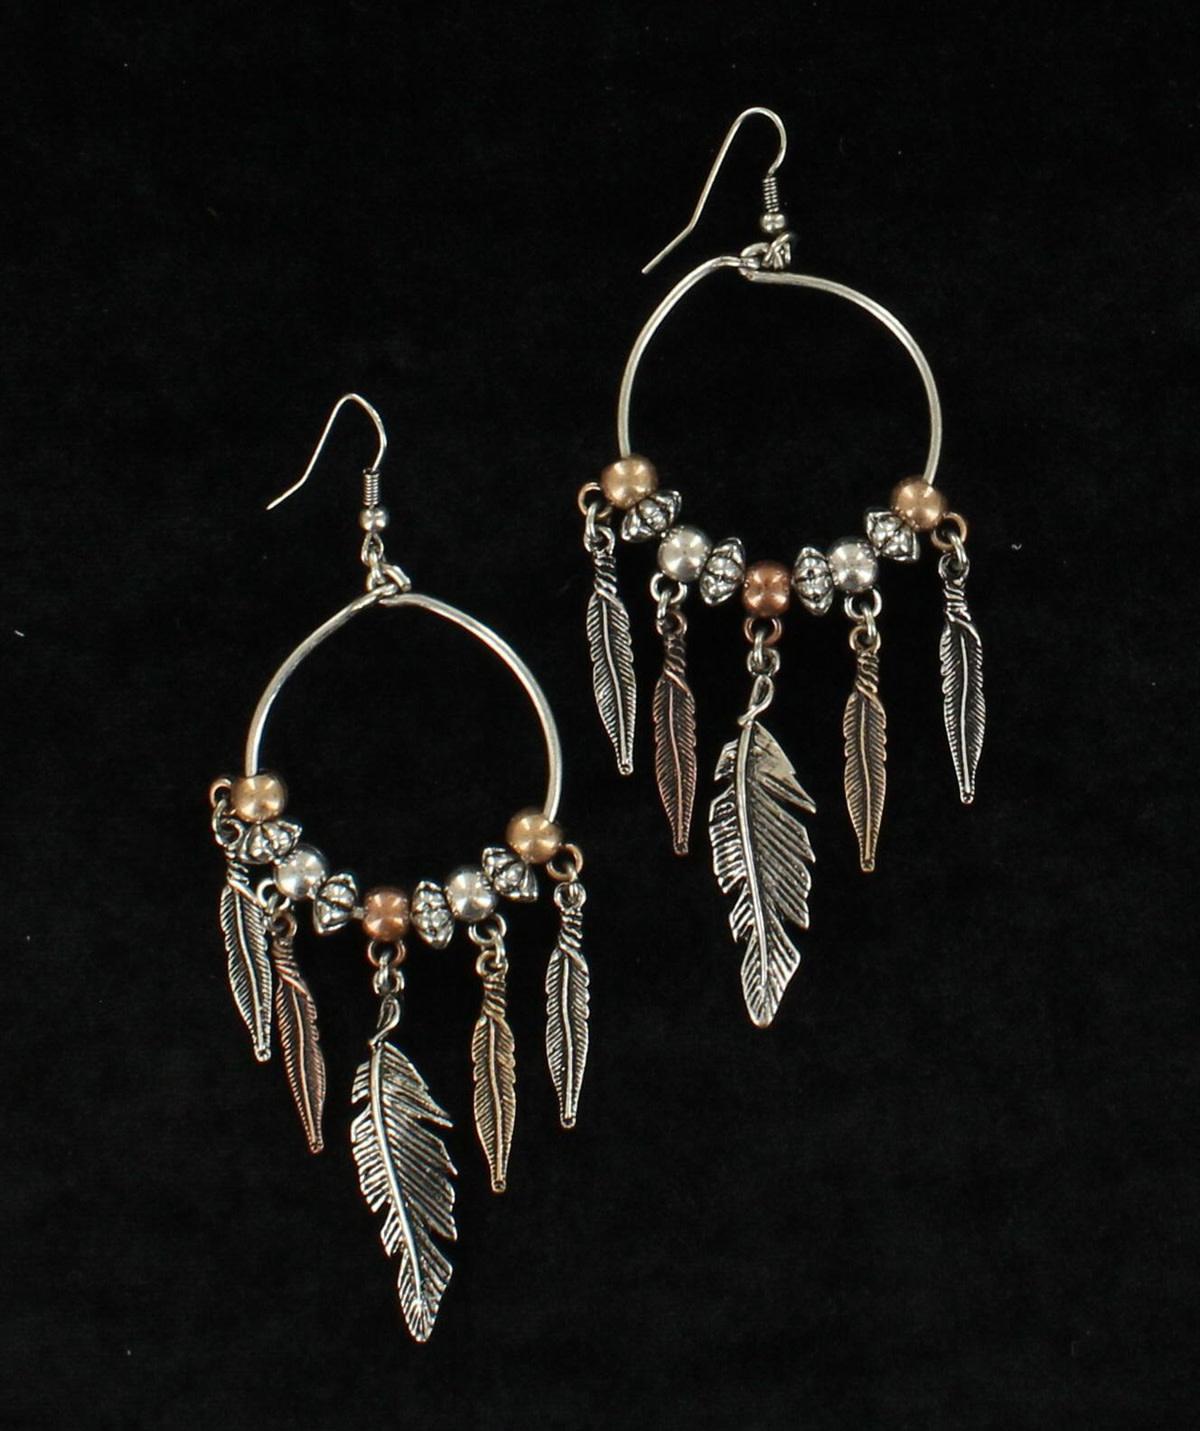 Earrings - Feather Drop Hoop Style